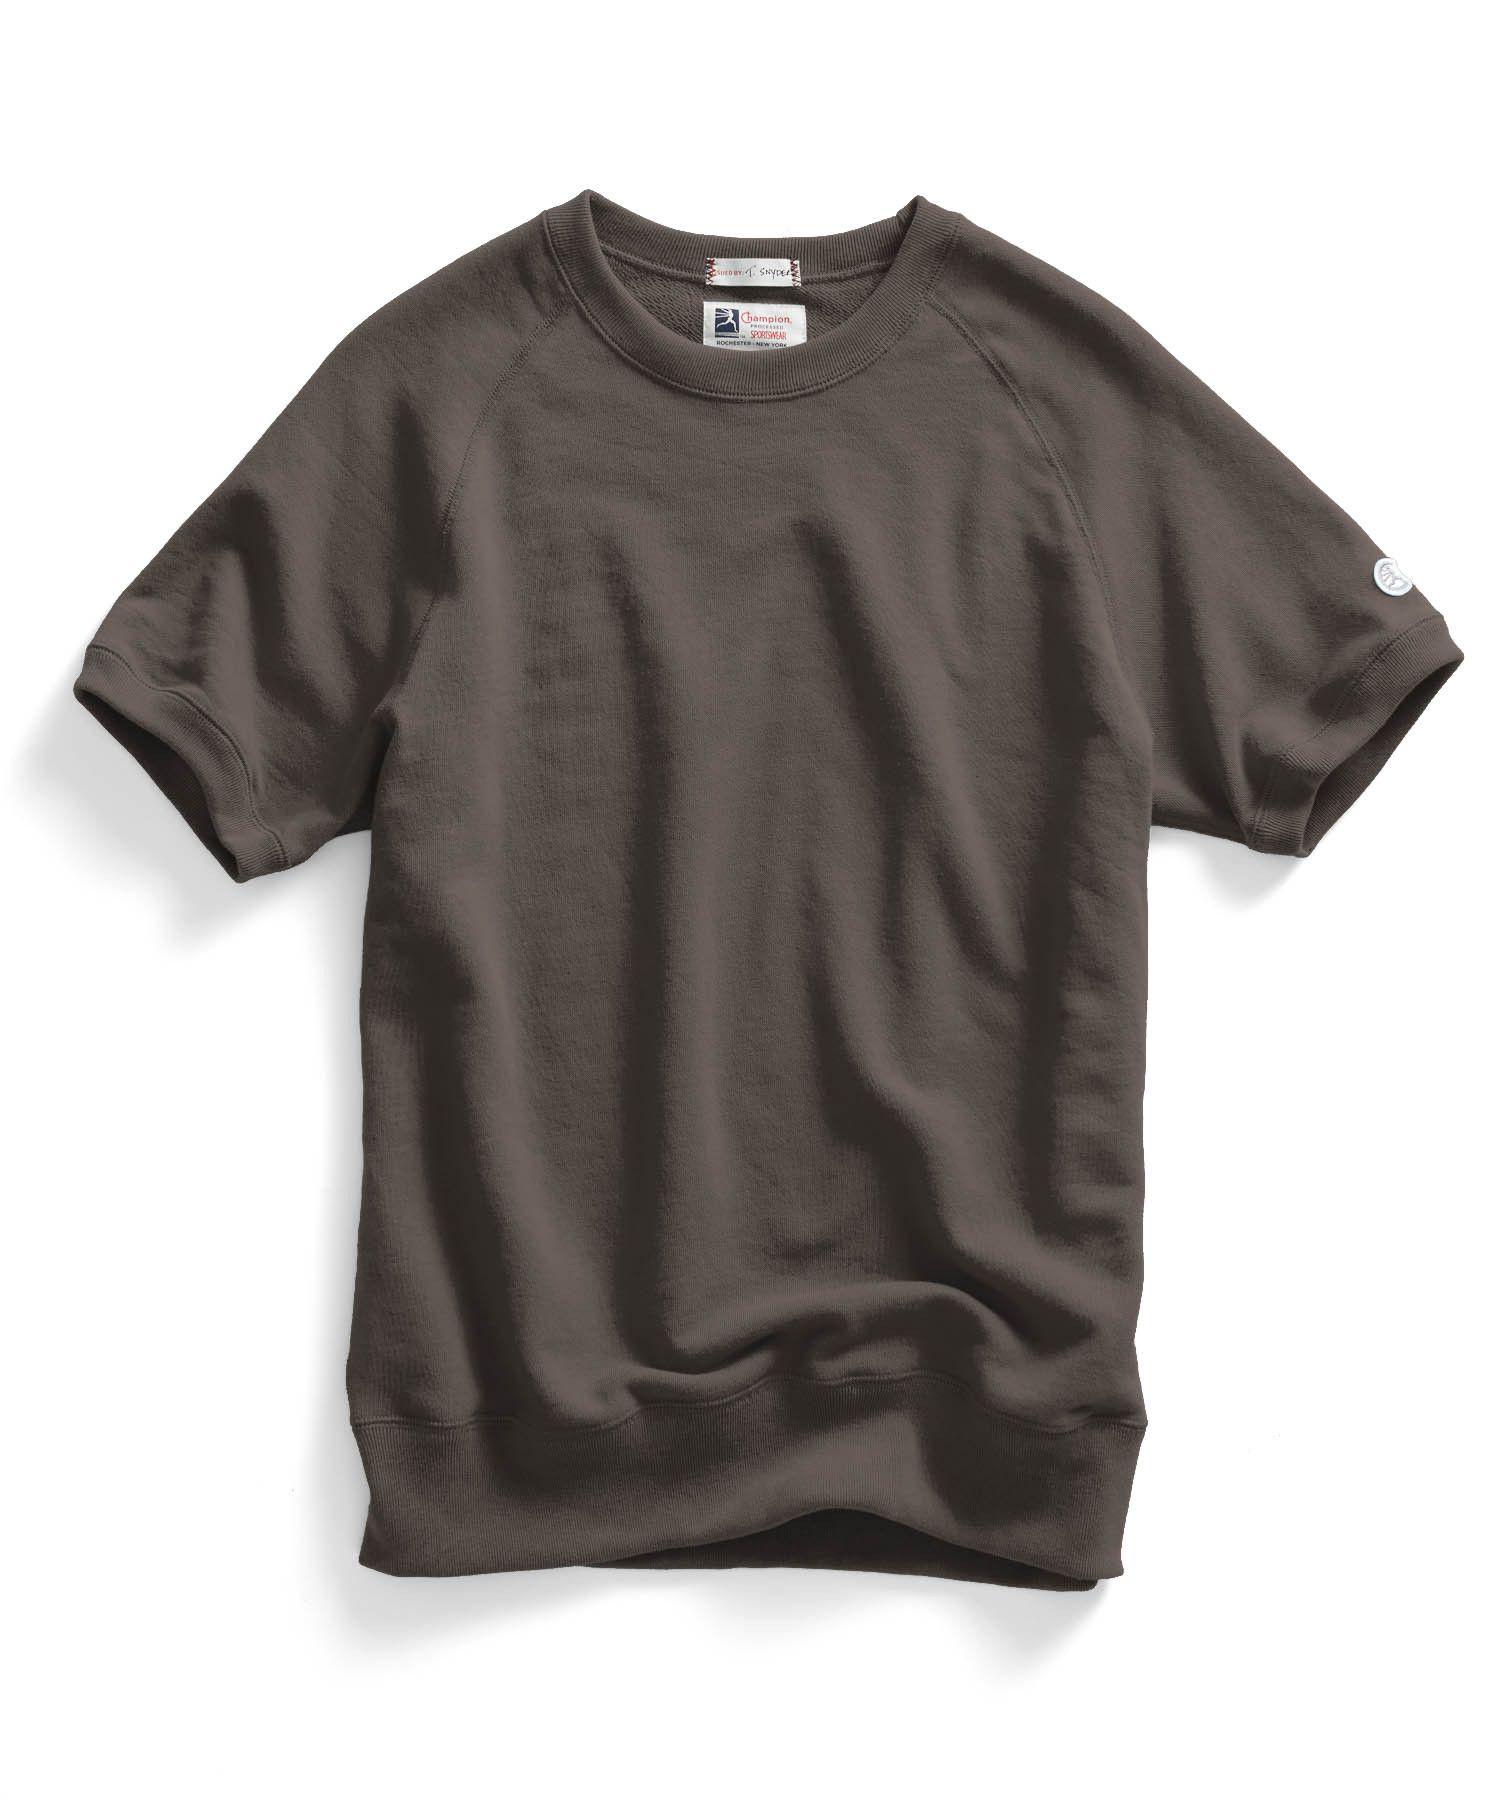 e75922ce Short Sleeve Sweatshirt in Earth Brown. Short Sleeve Sweatshirt in Earth  Brown Todd Snyder Champion ...